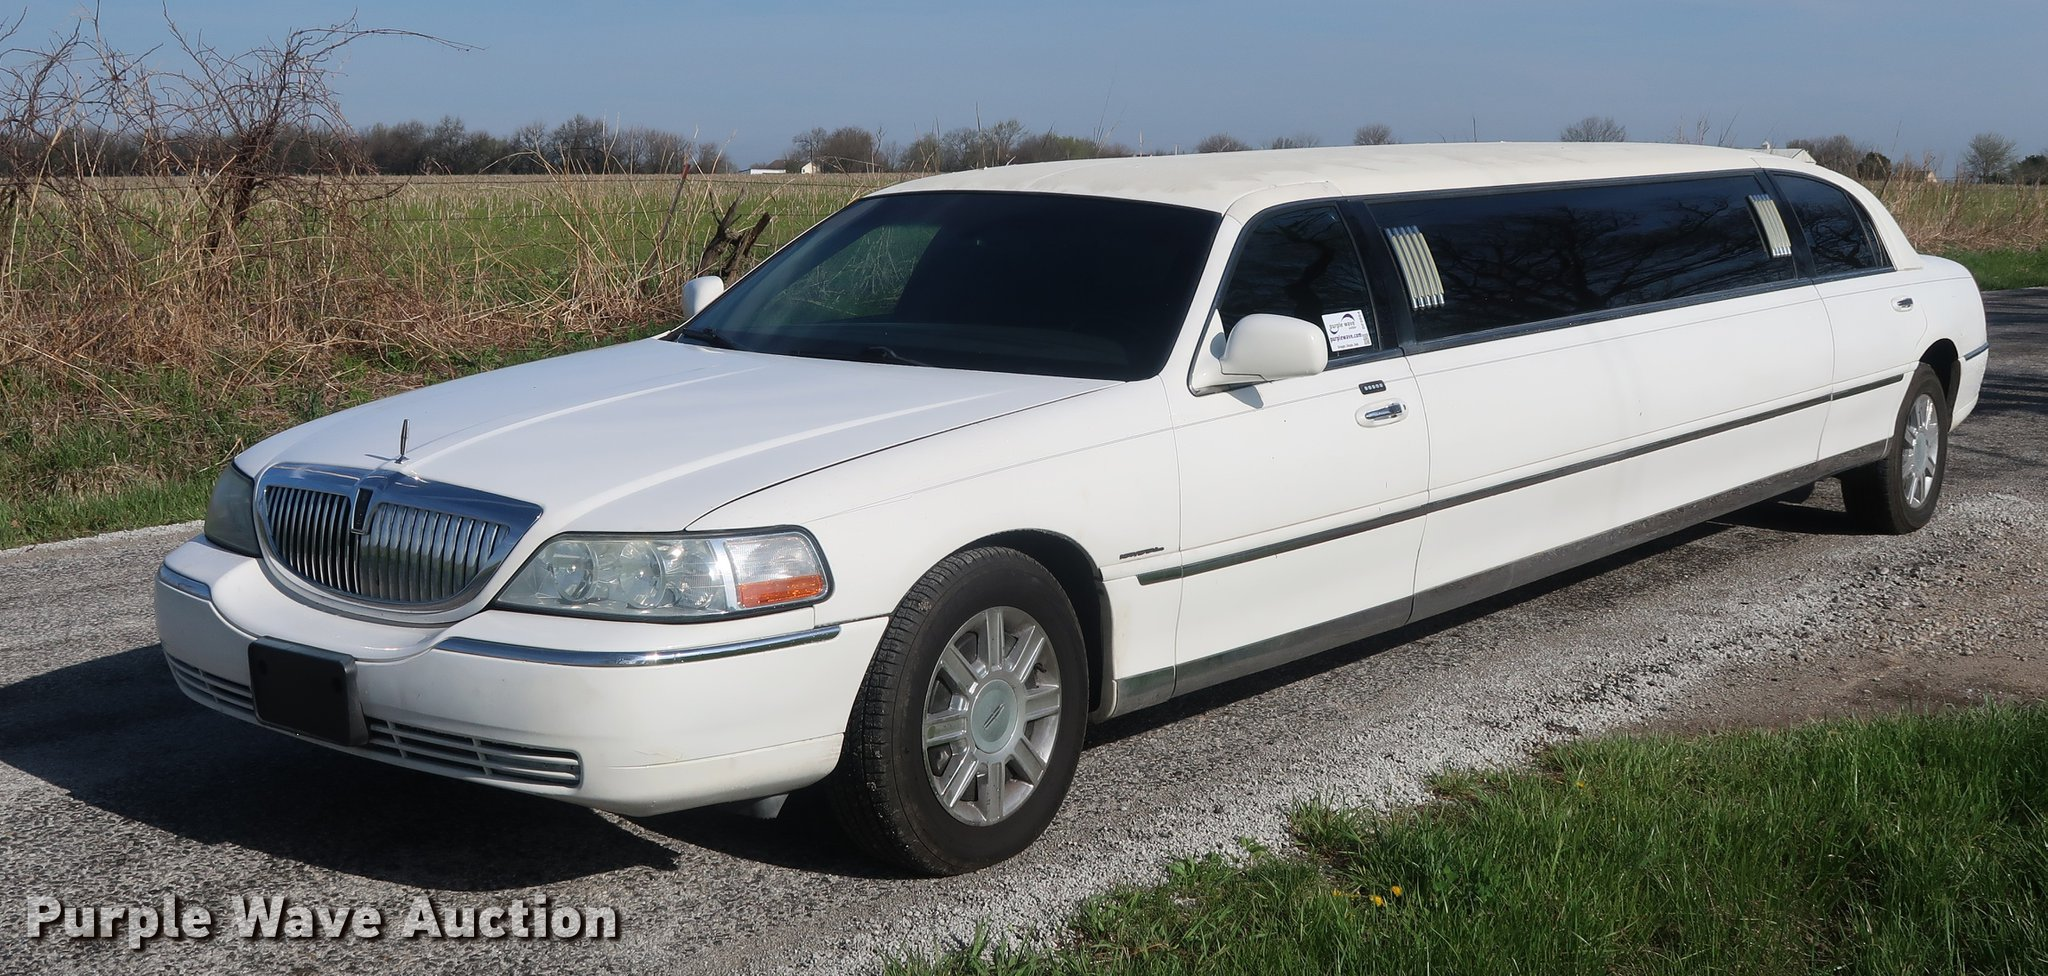 2006 Lincoln Town Car Executive Limousine Item Df3654 So